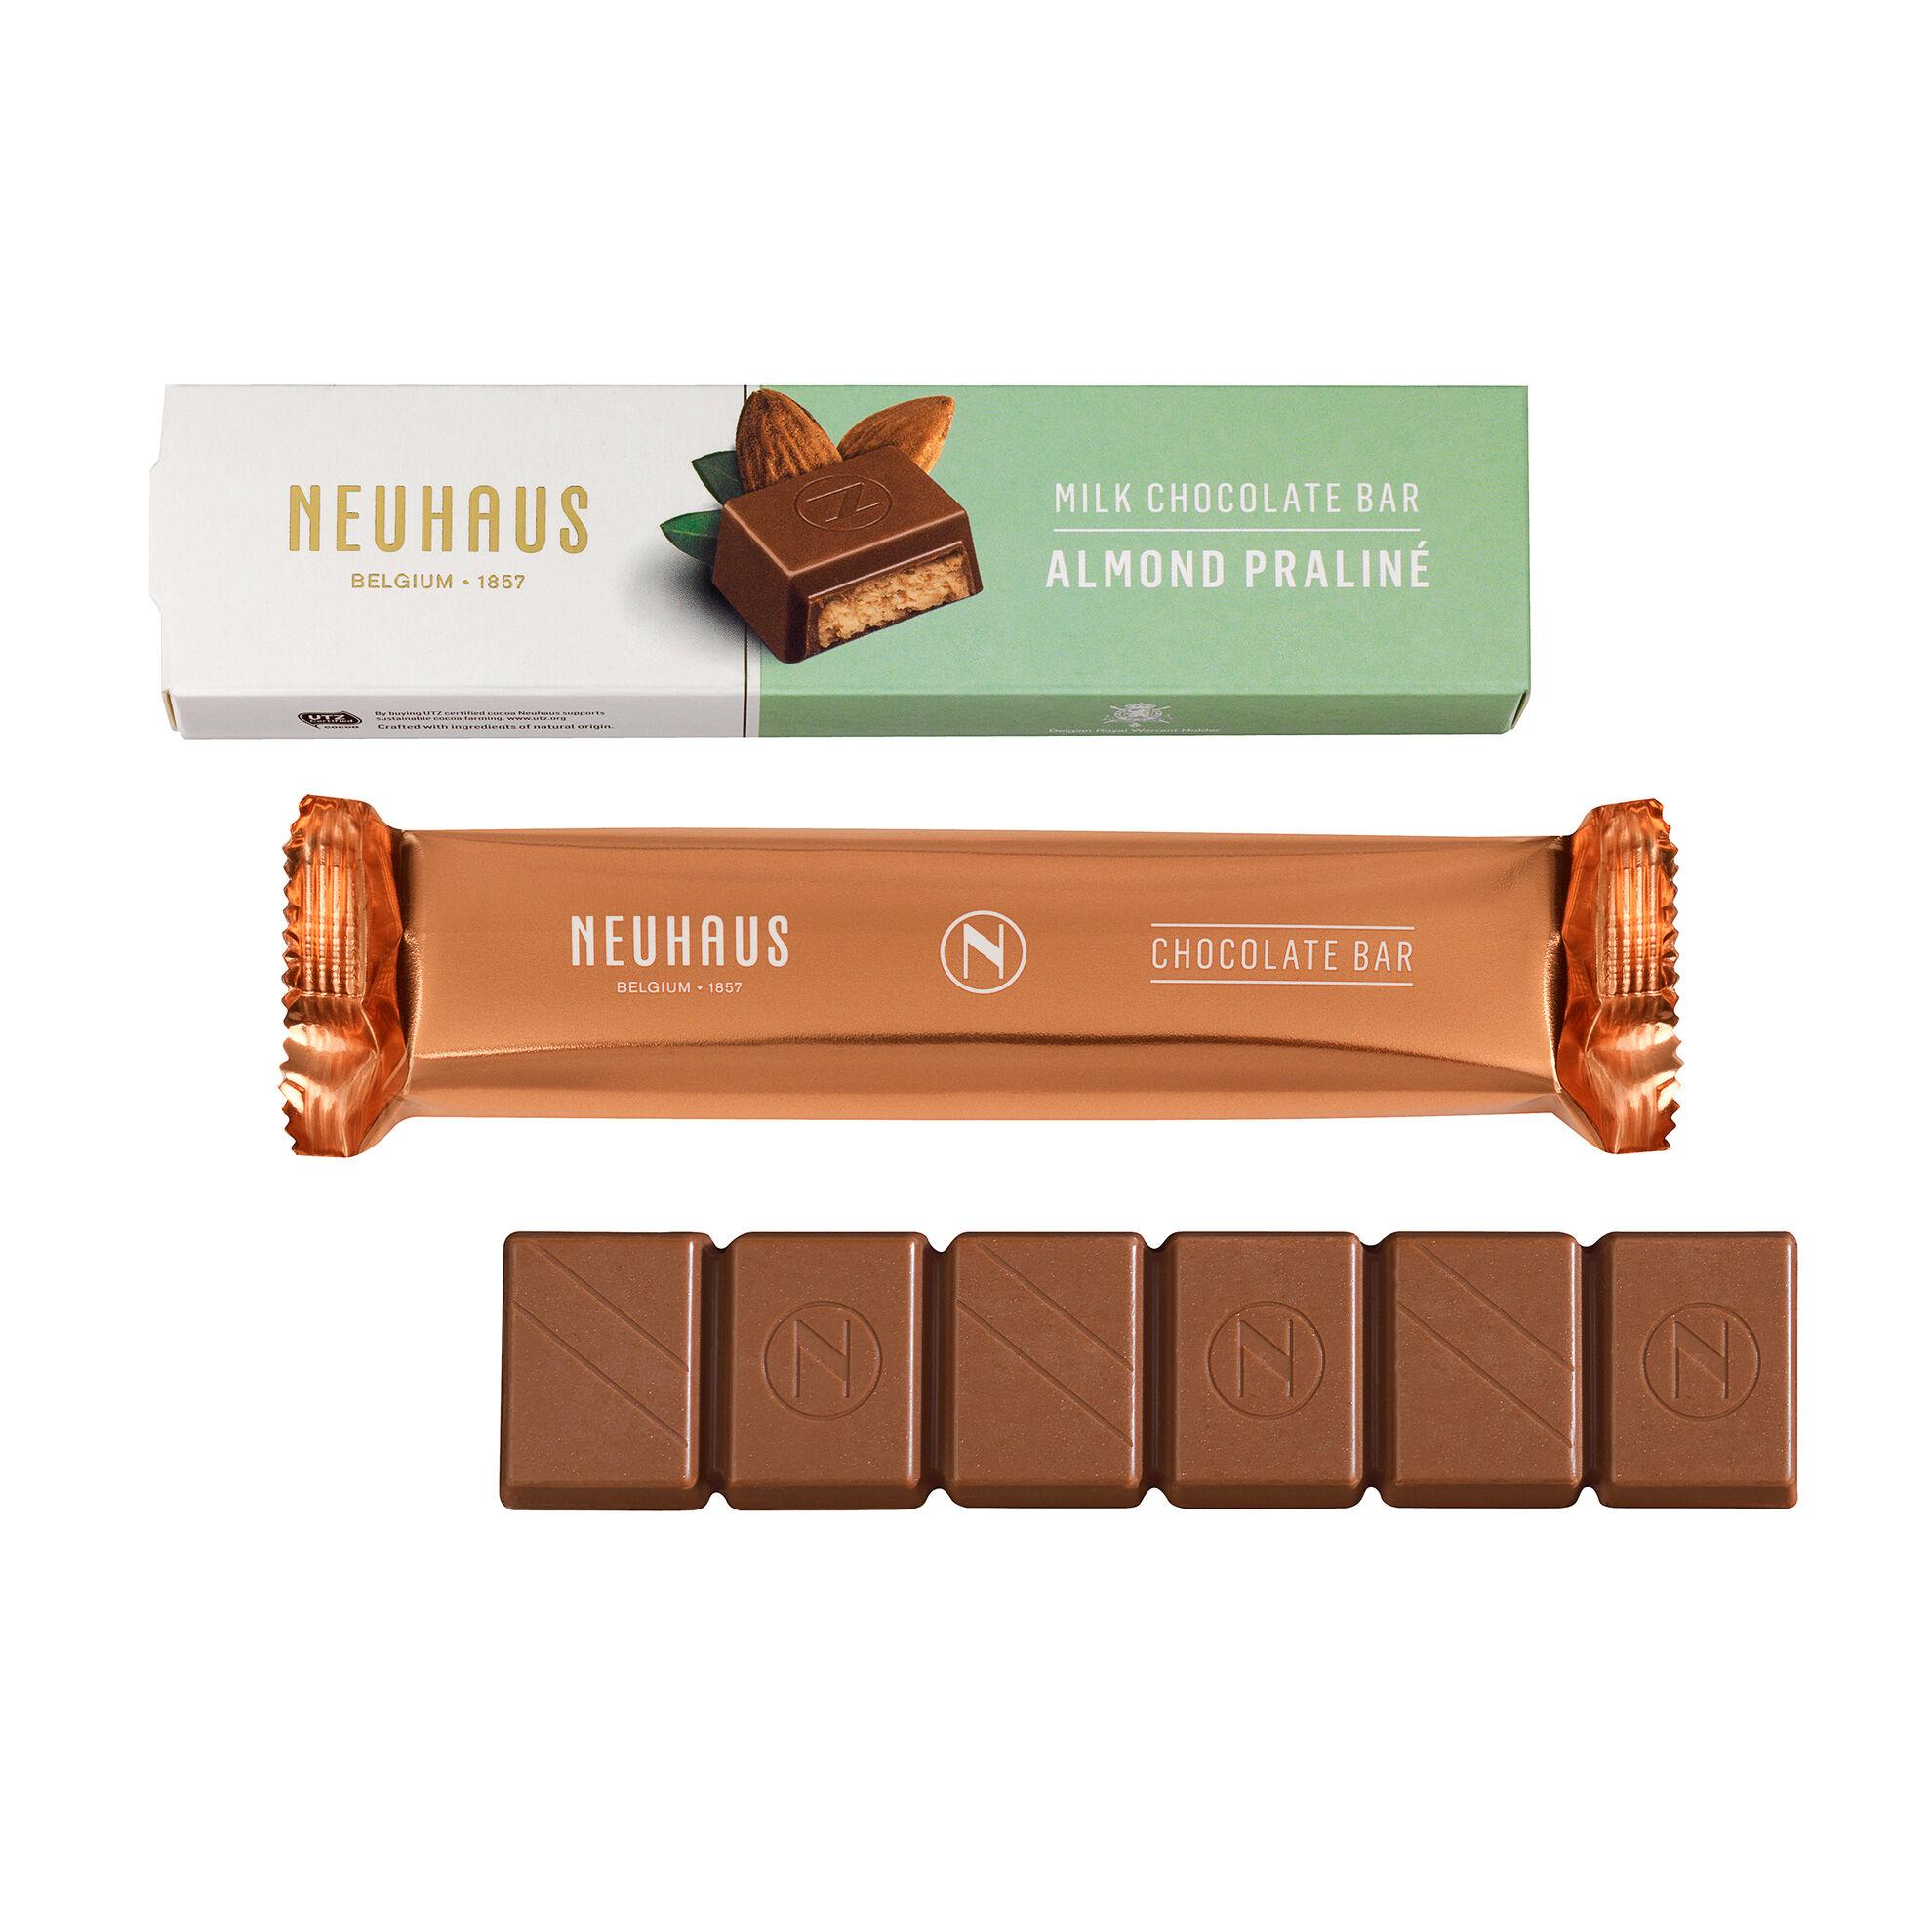 Barre chocolat praliné amandes image number 01